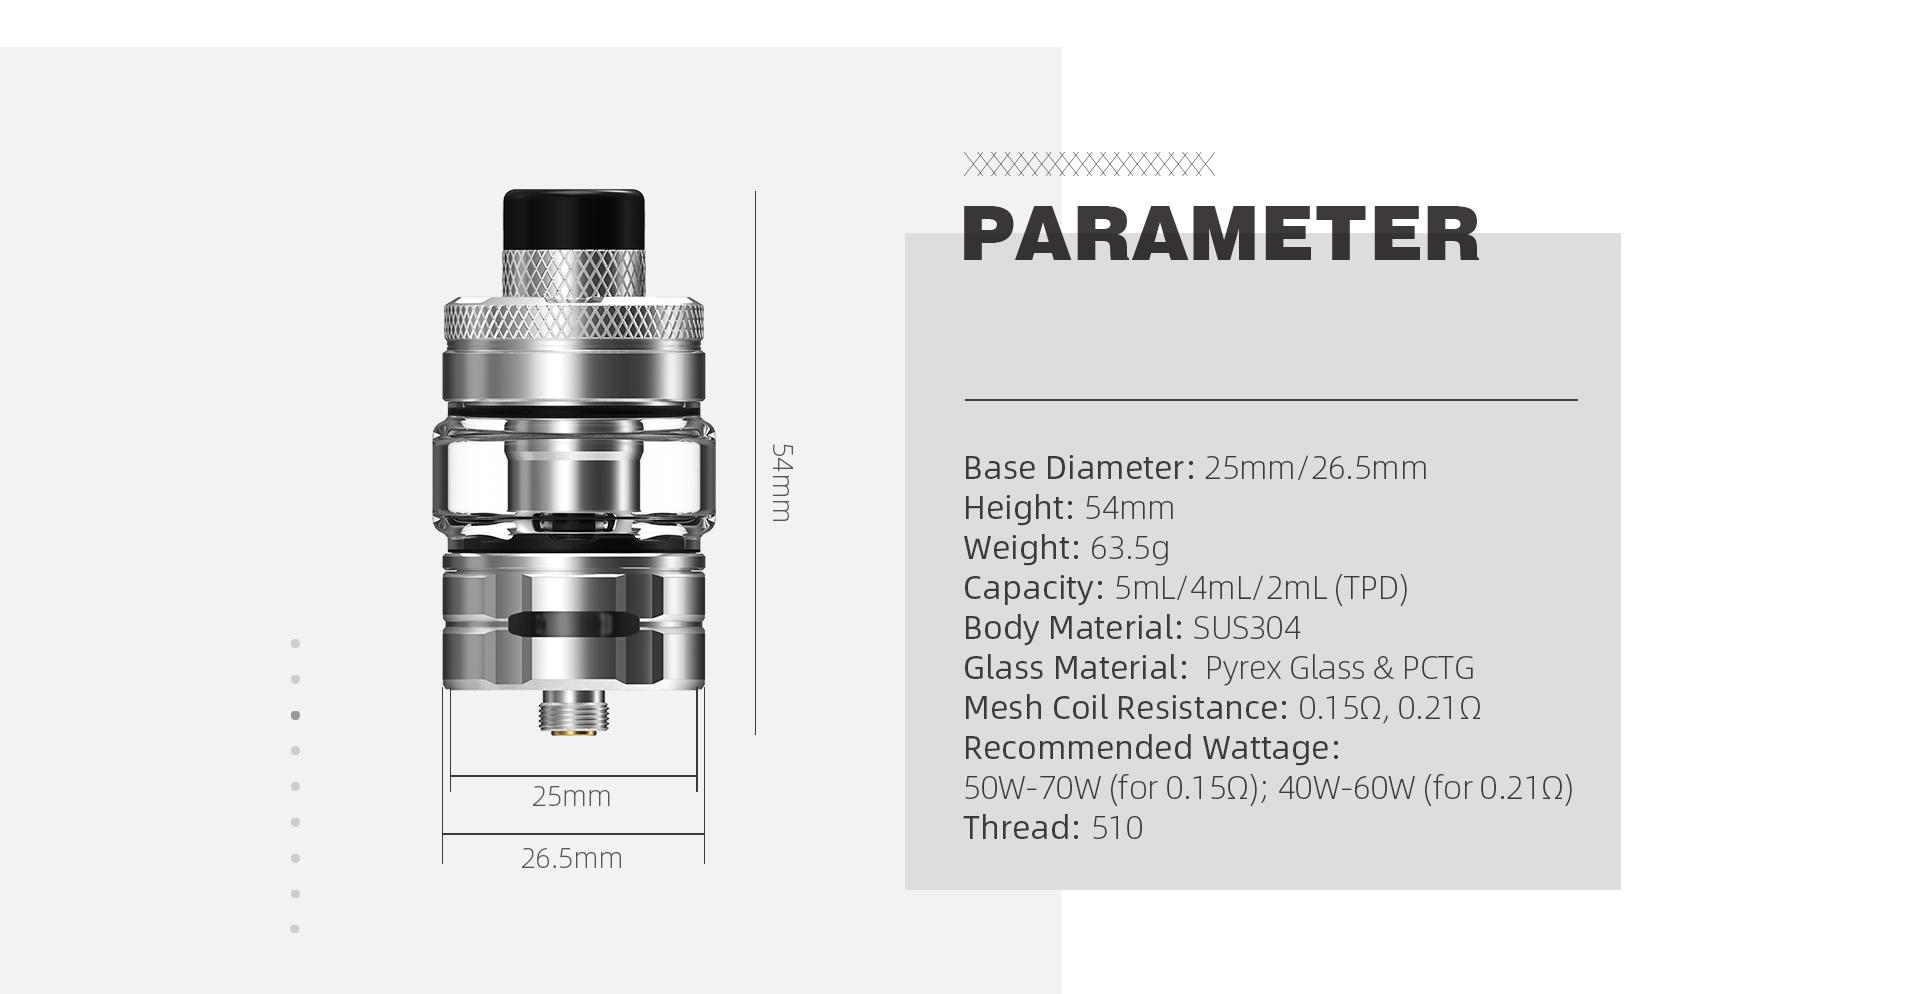 wirice launcher tank - parameter